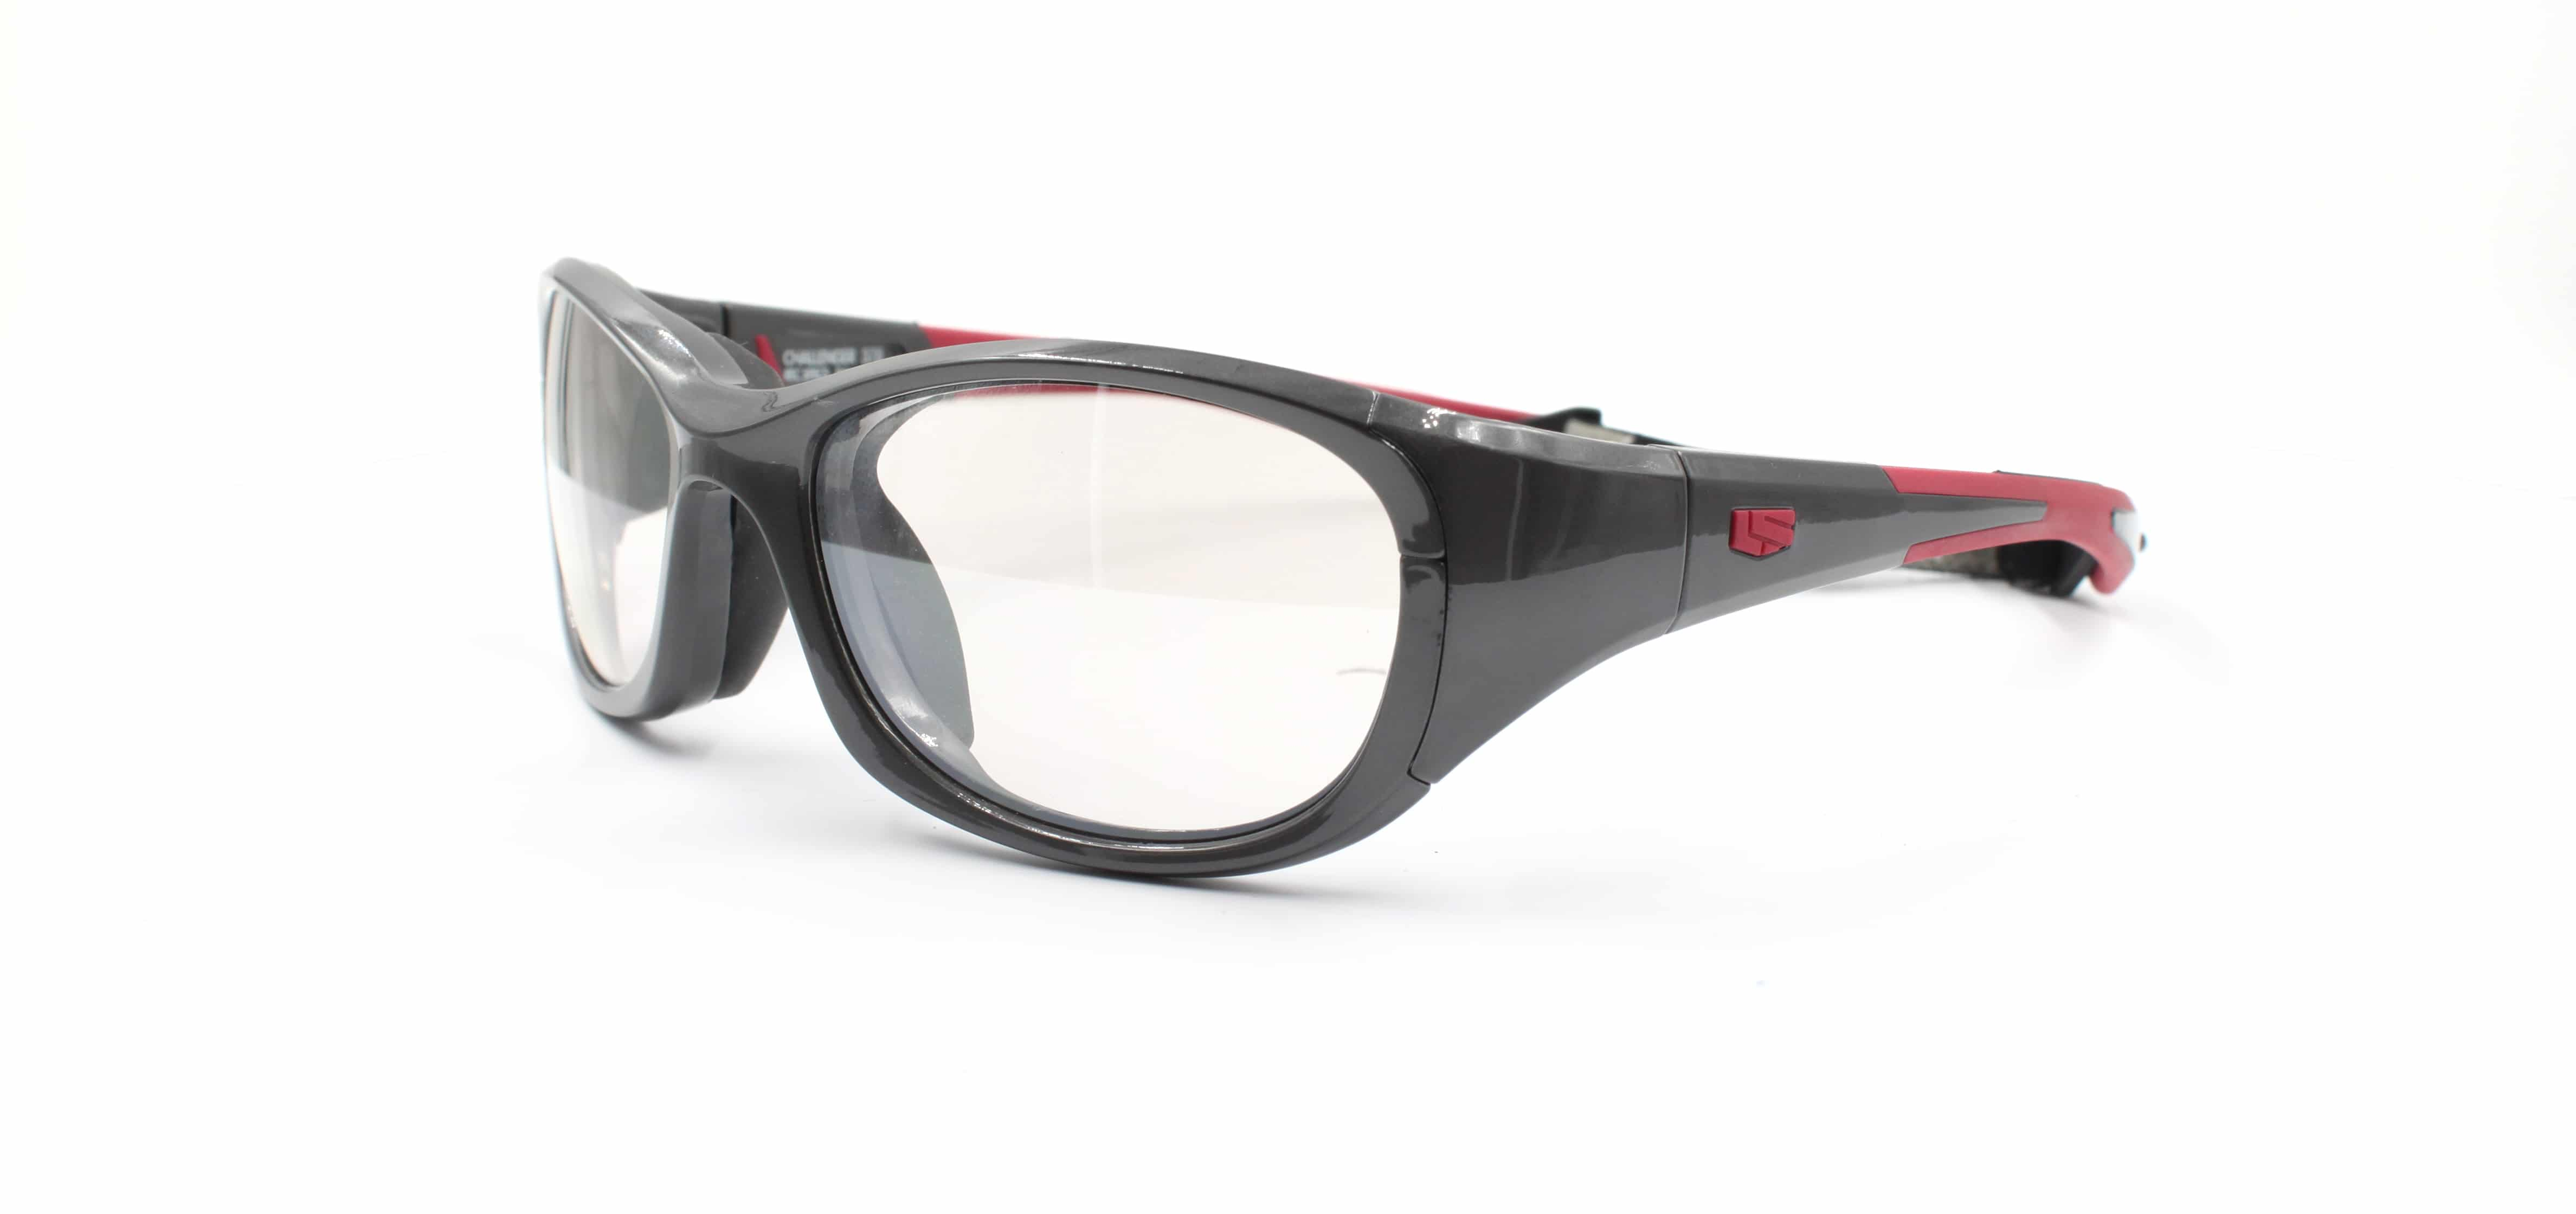 e289da39637b Rec Specs Challenger XL | ANSI Rated Industrial Safety Eyeglasses ...